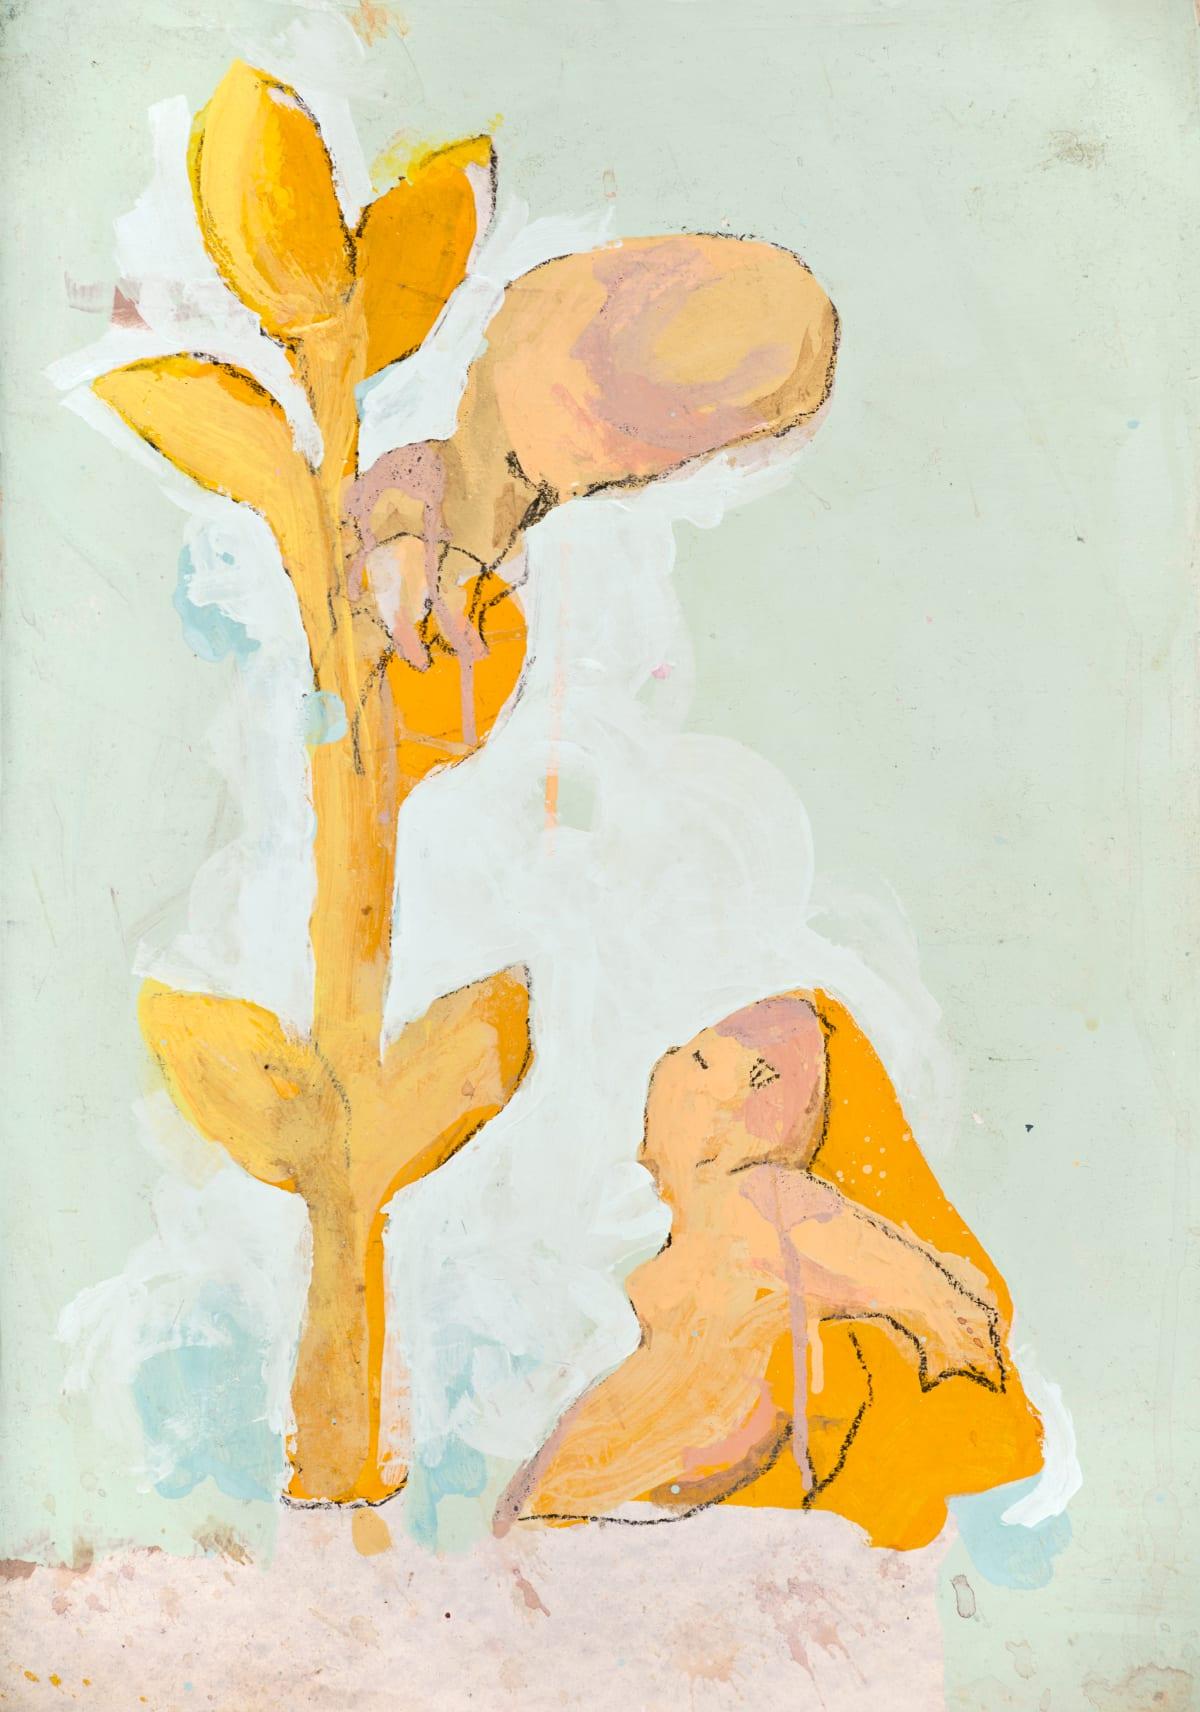 Erkut Terliksiz, Levitation I, 2014